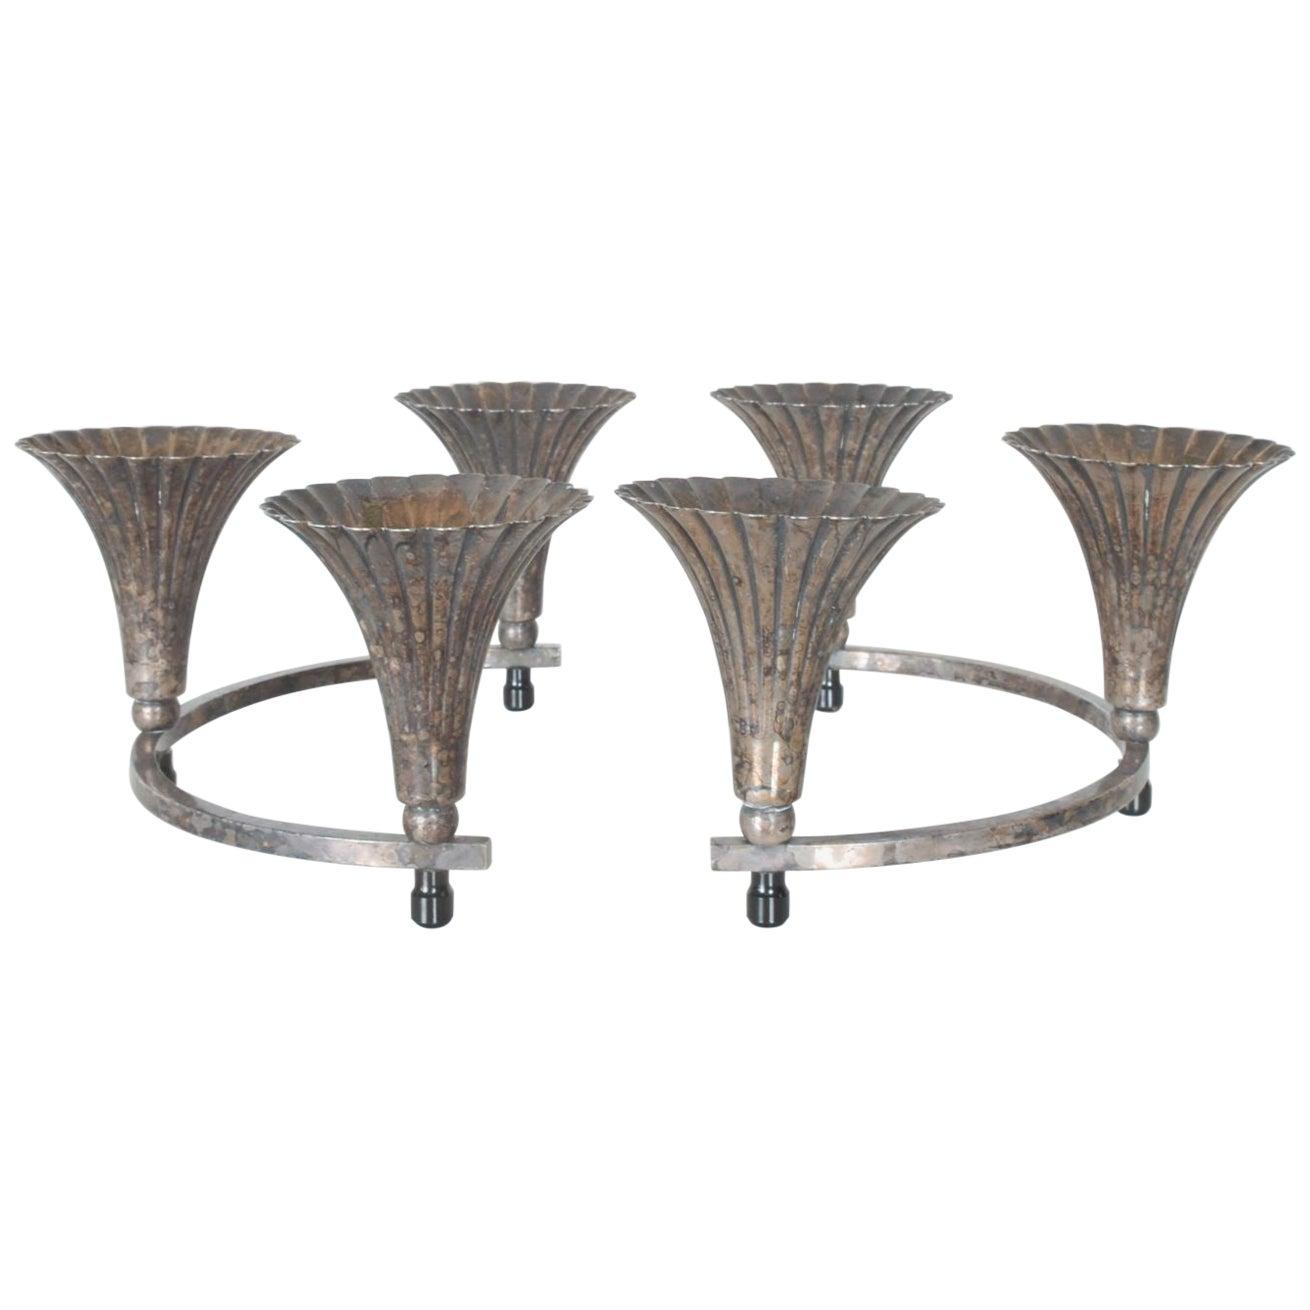 Sheffield Silver Circular Candelabra Centerpiece with 6 Candleholders